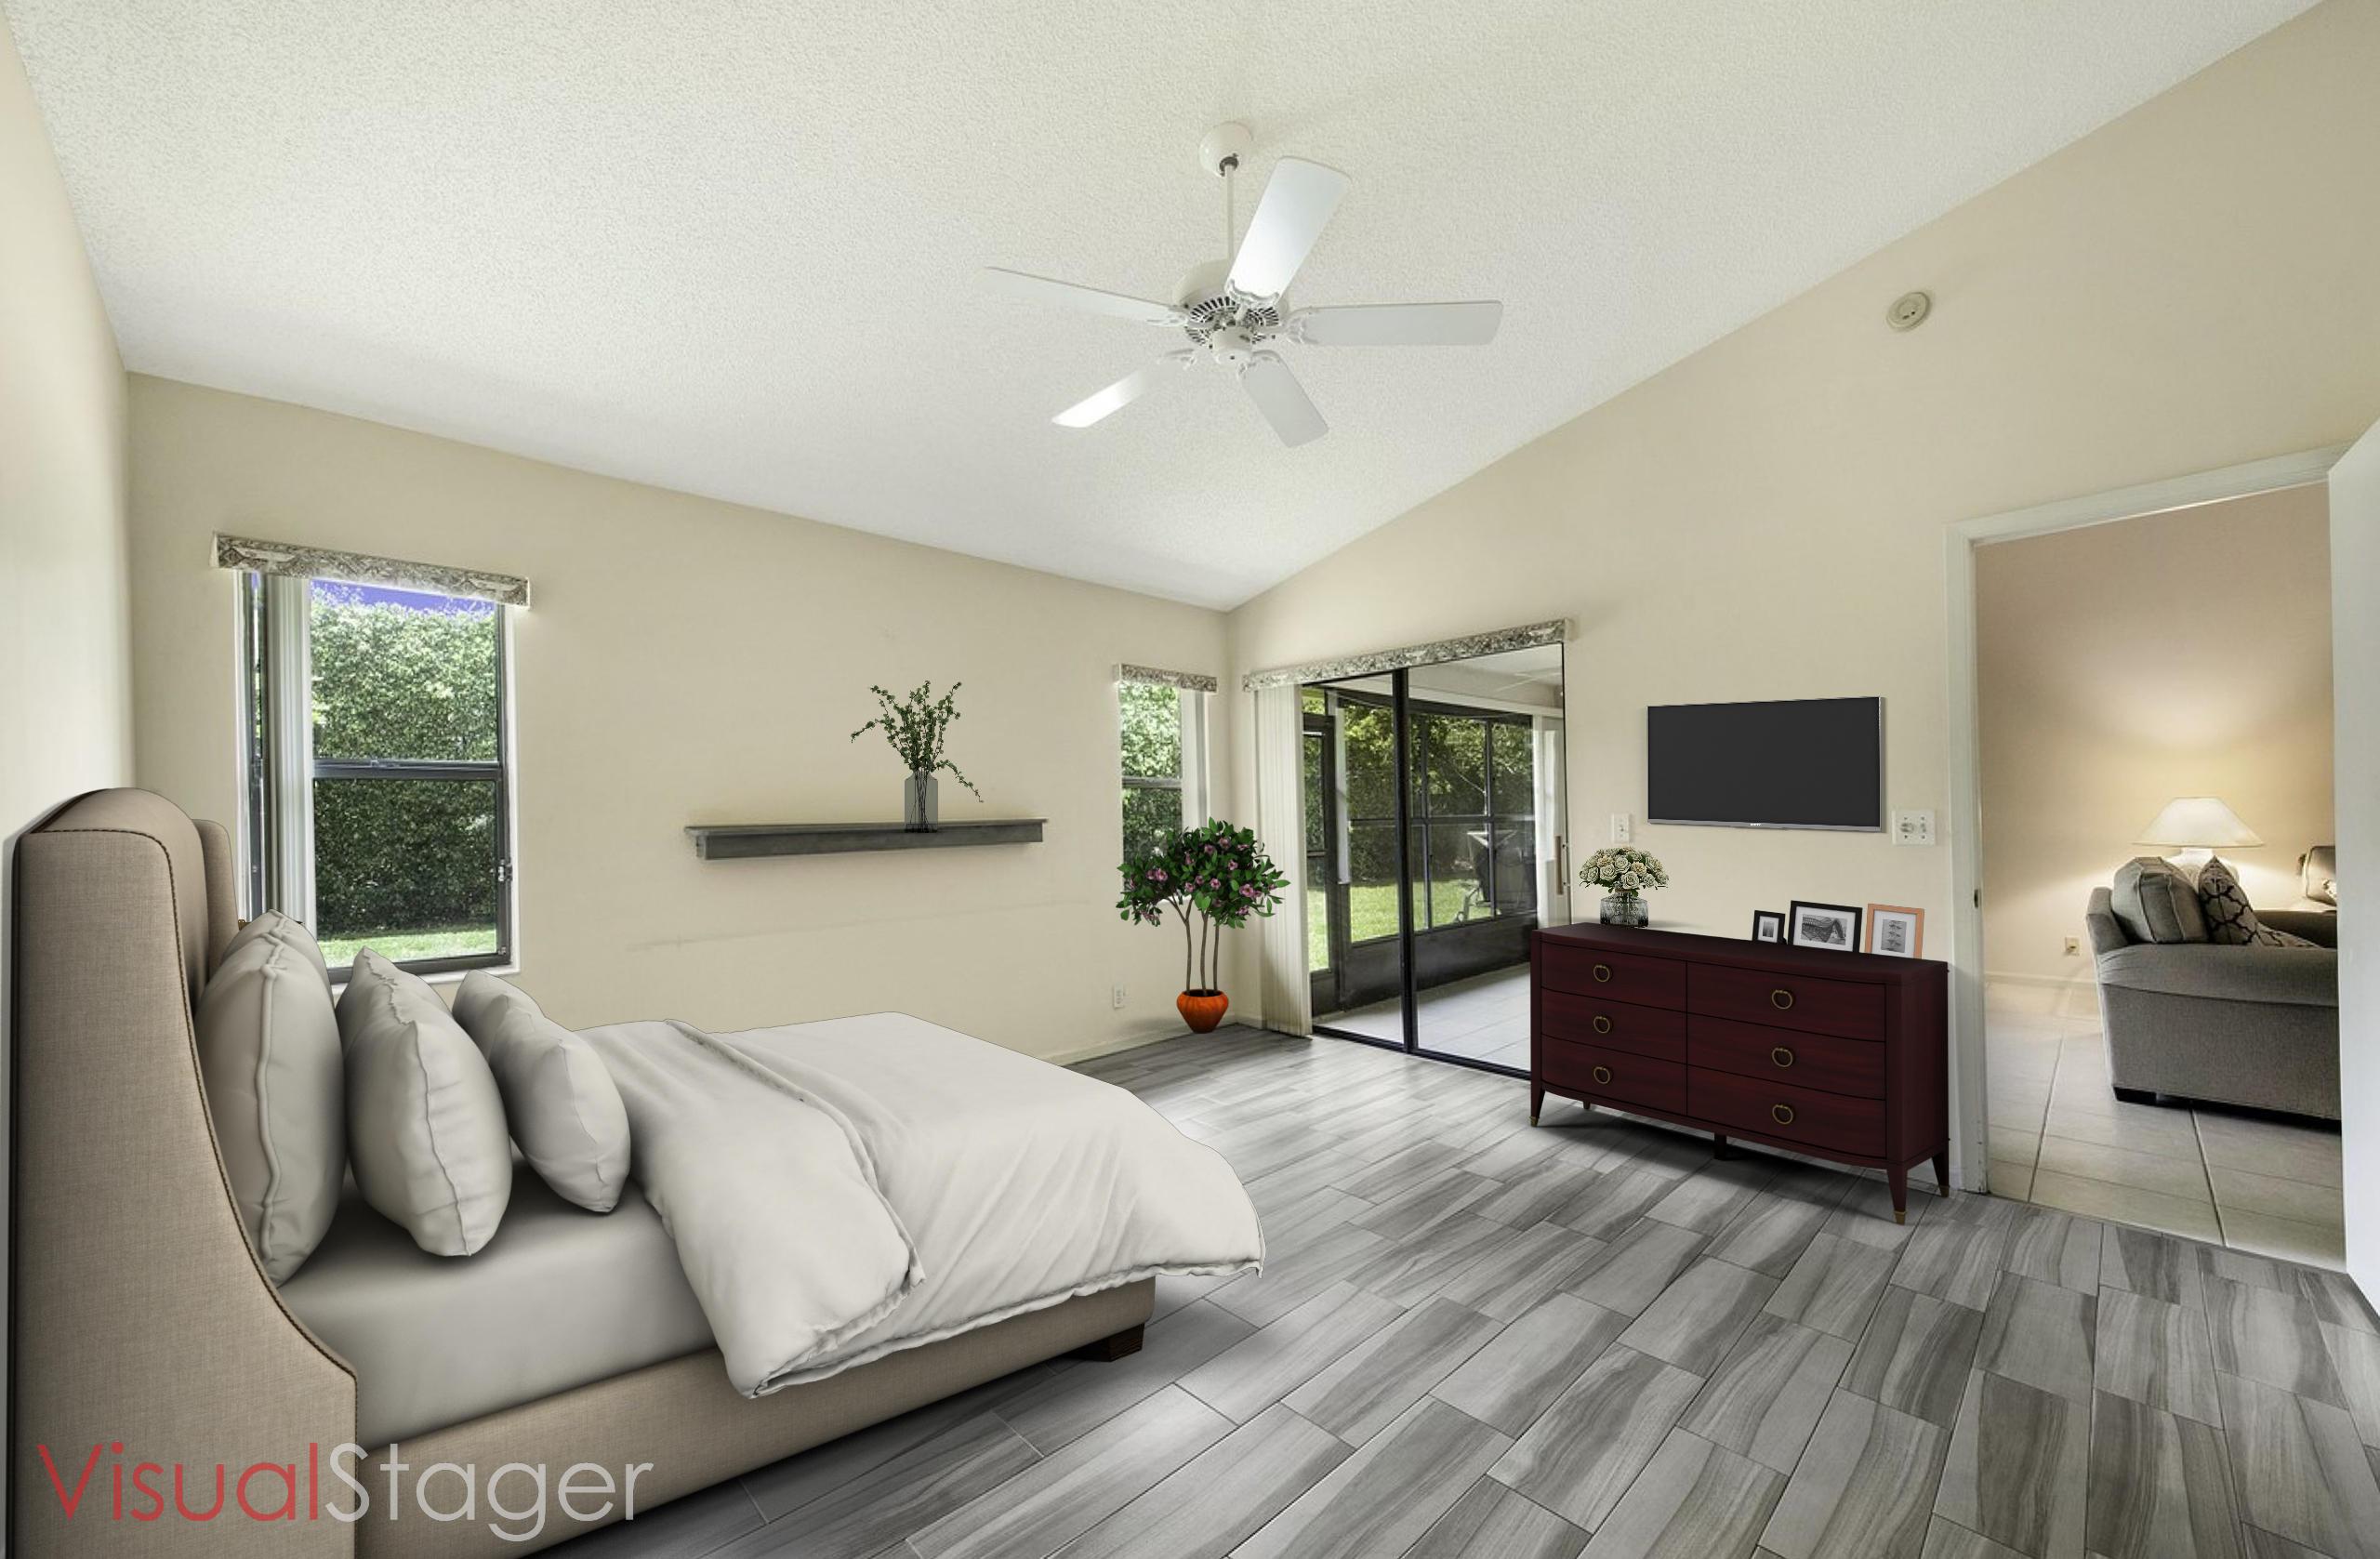 9747 Pavarotti Terrace 103 Boynton Beach, FL 33437 photo 17